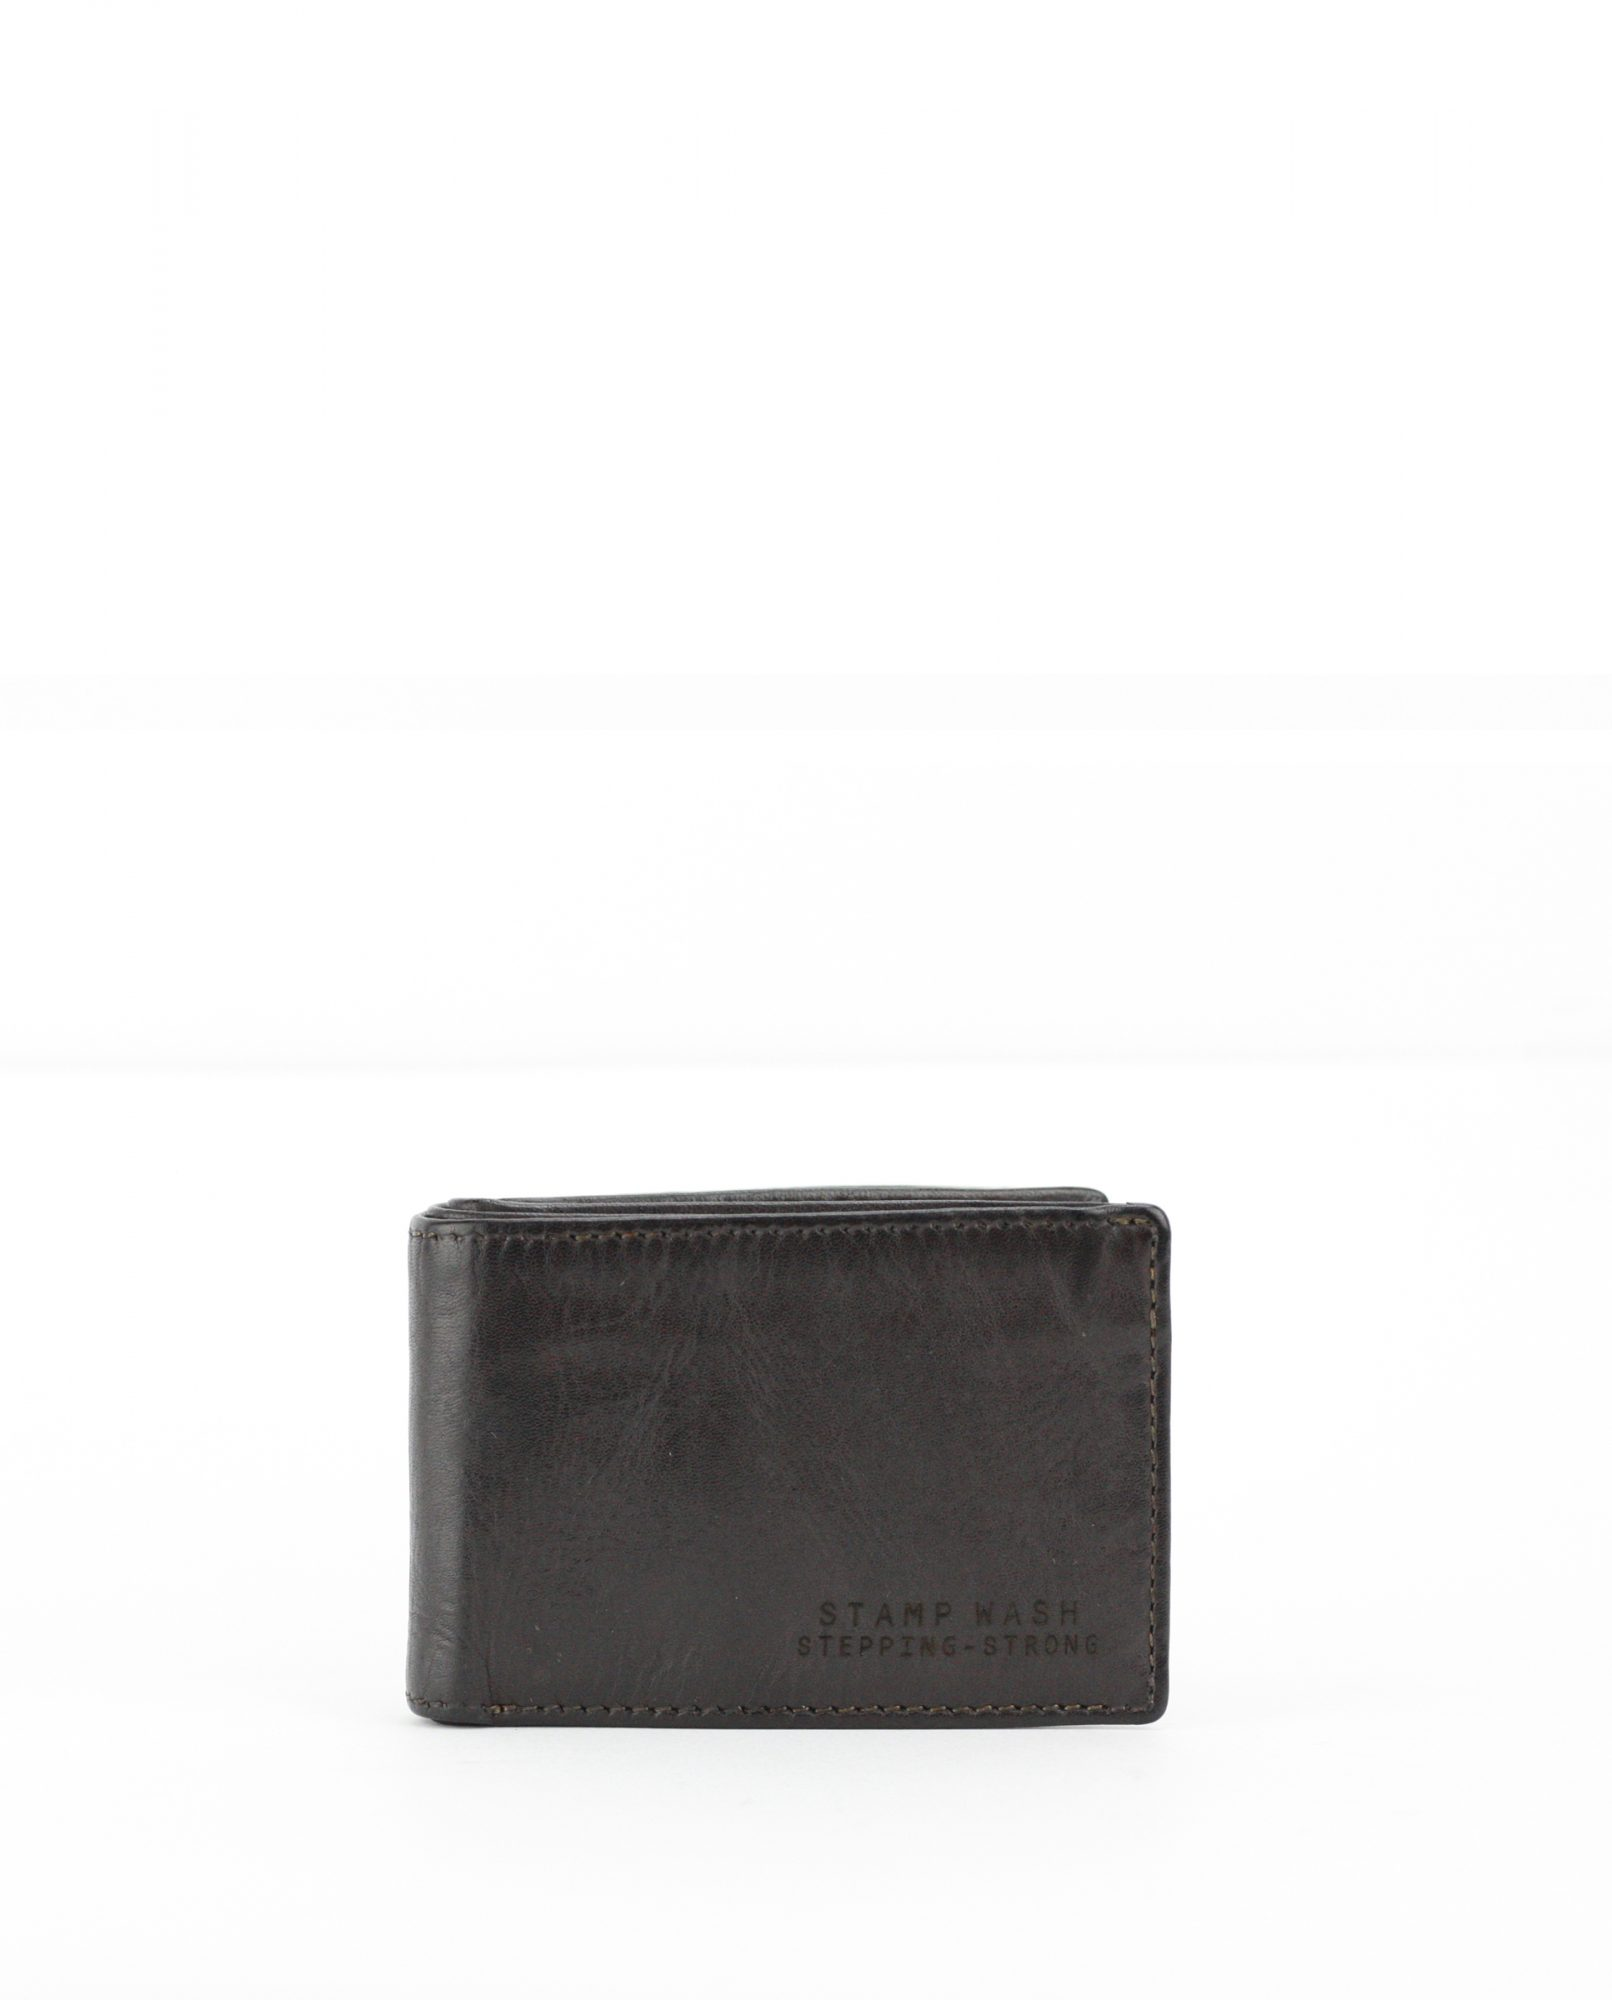 TICHI-Billetero de piel Stamp color marrón-MHST11985MA-STAMP